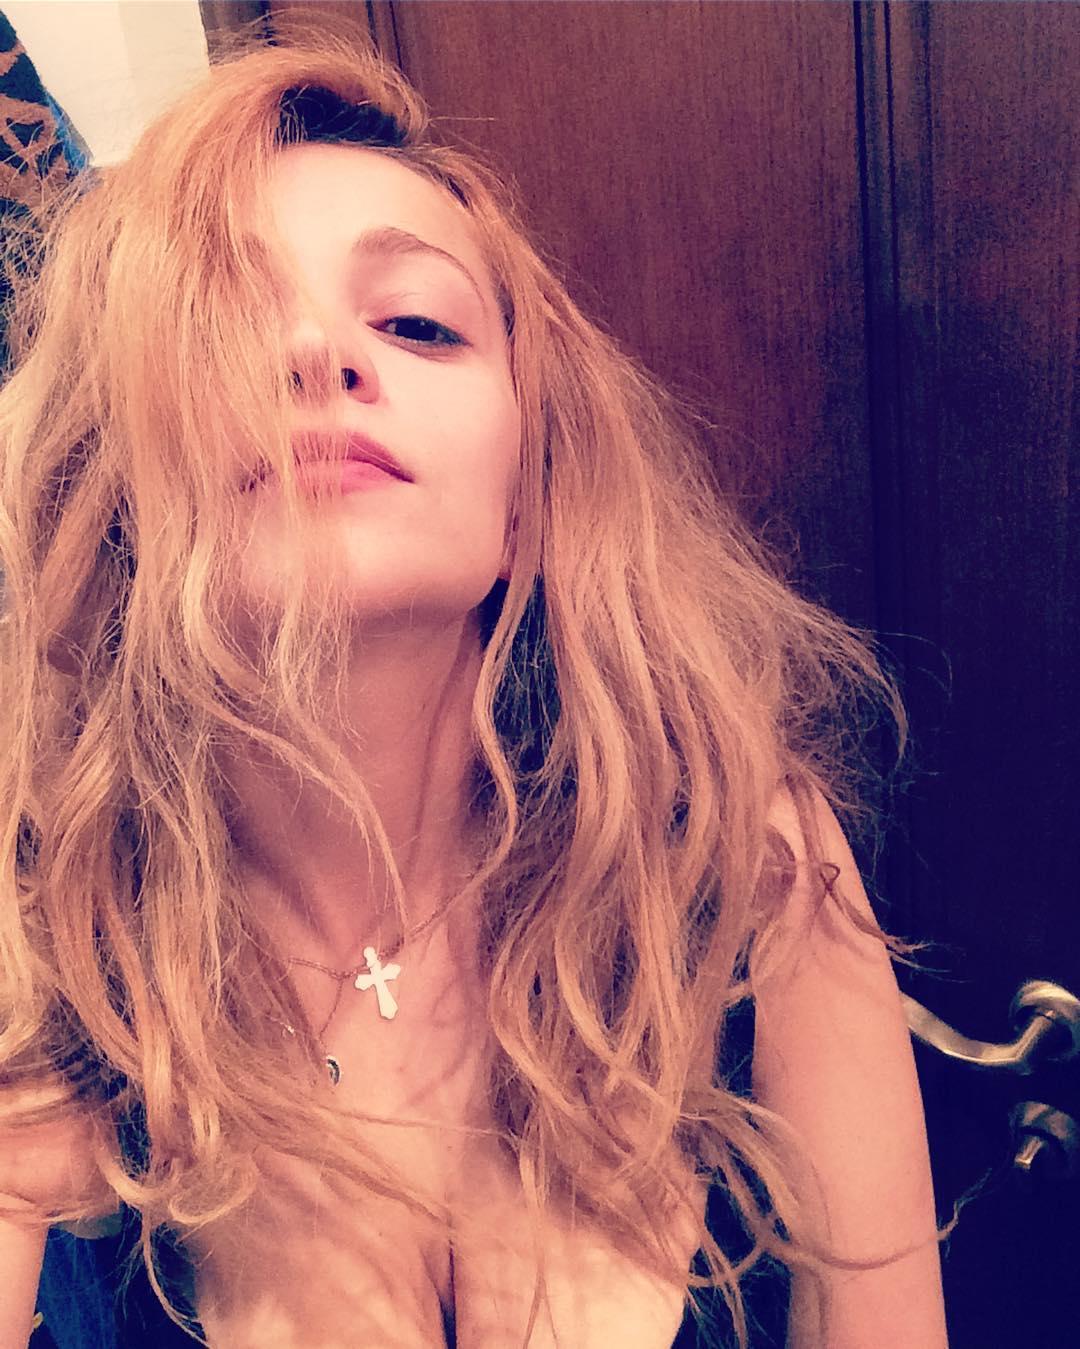 Теона Дольникова: Just the way you are